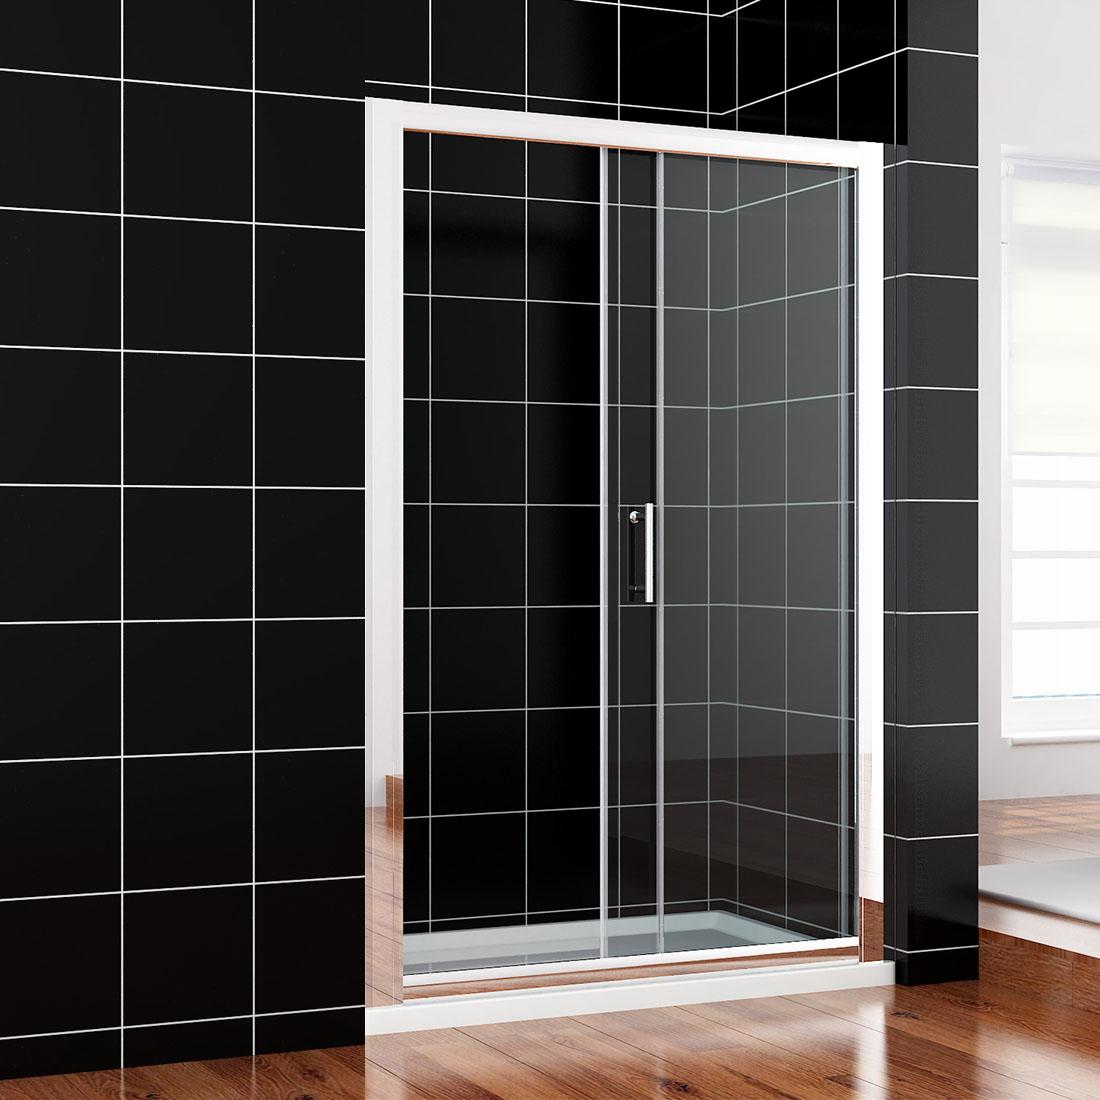 Faltt r dusche dichtung verschiedene for Luxus shower doors